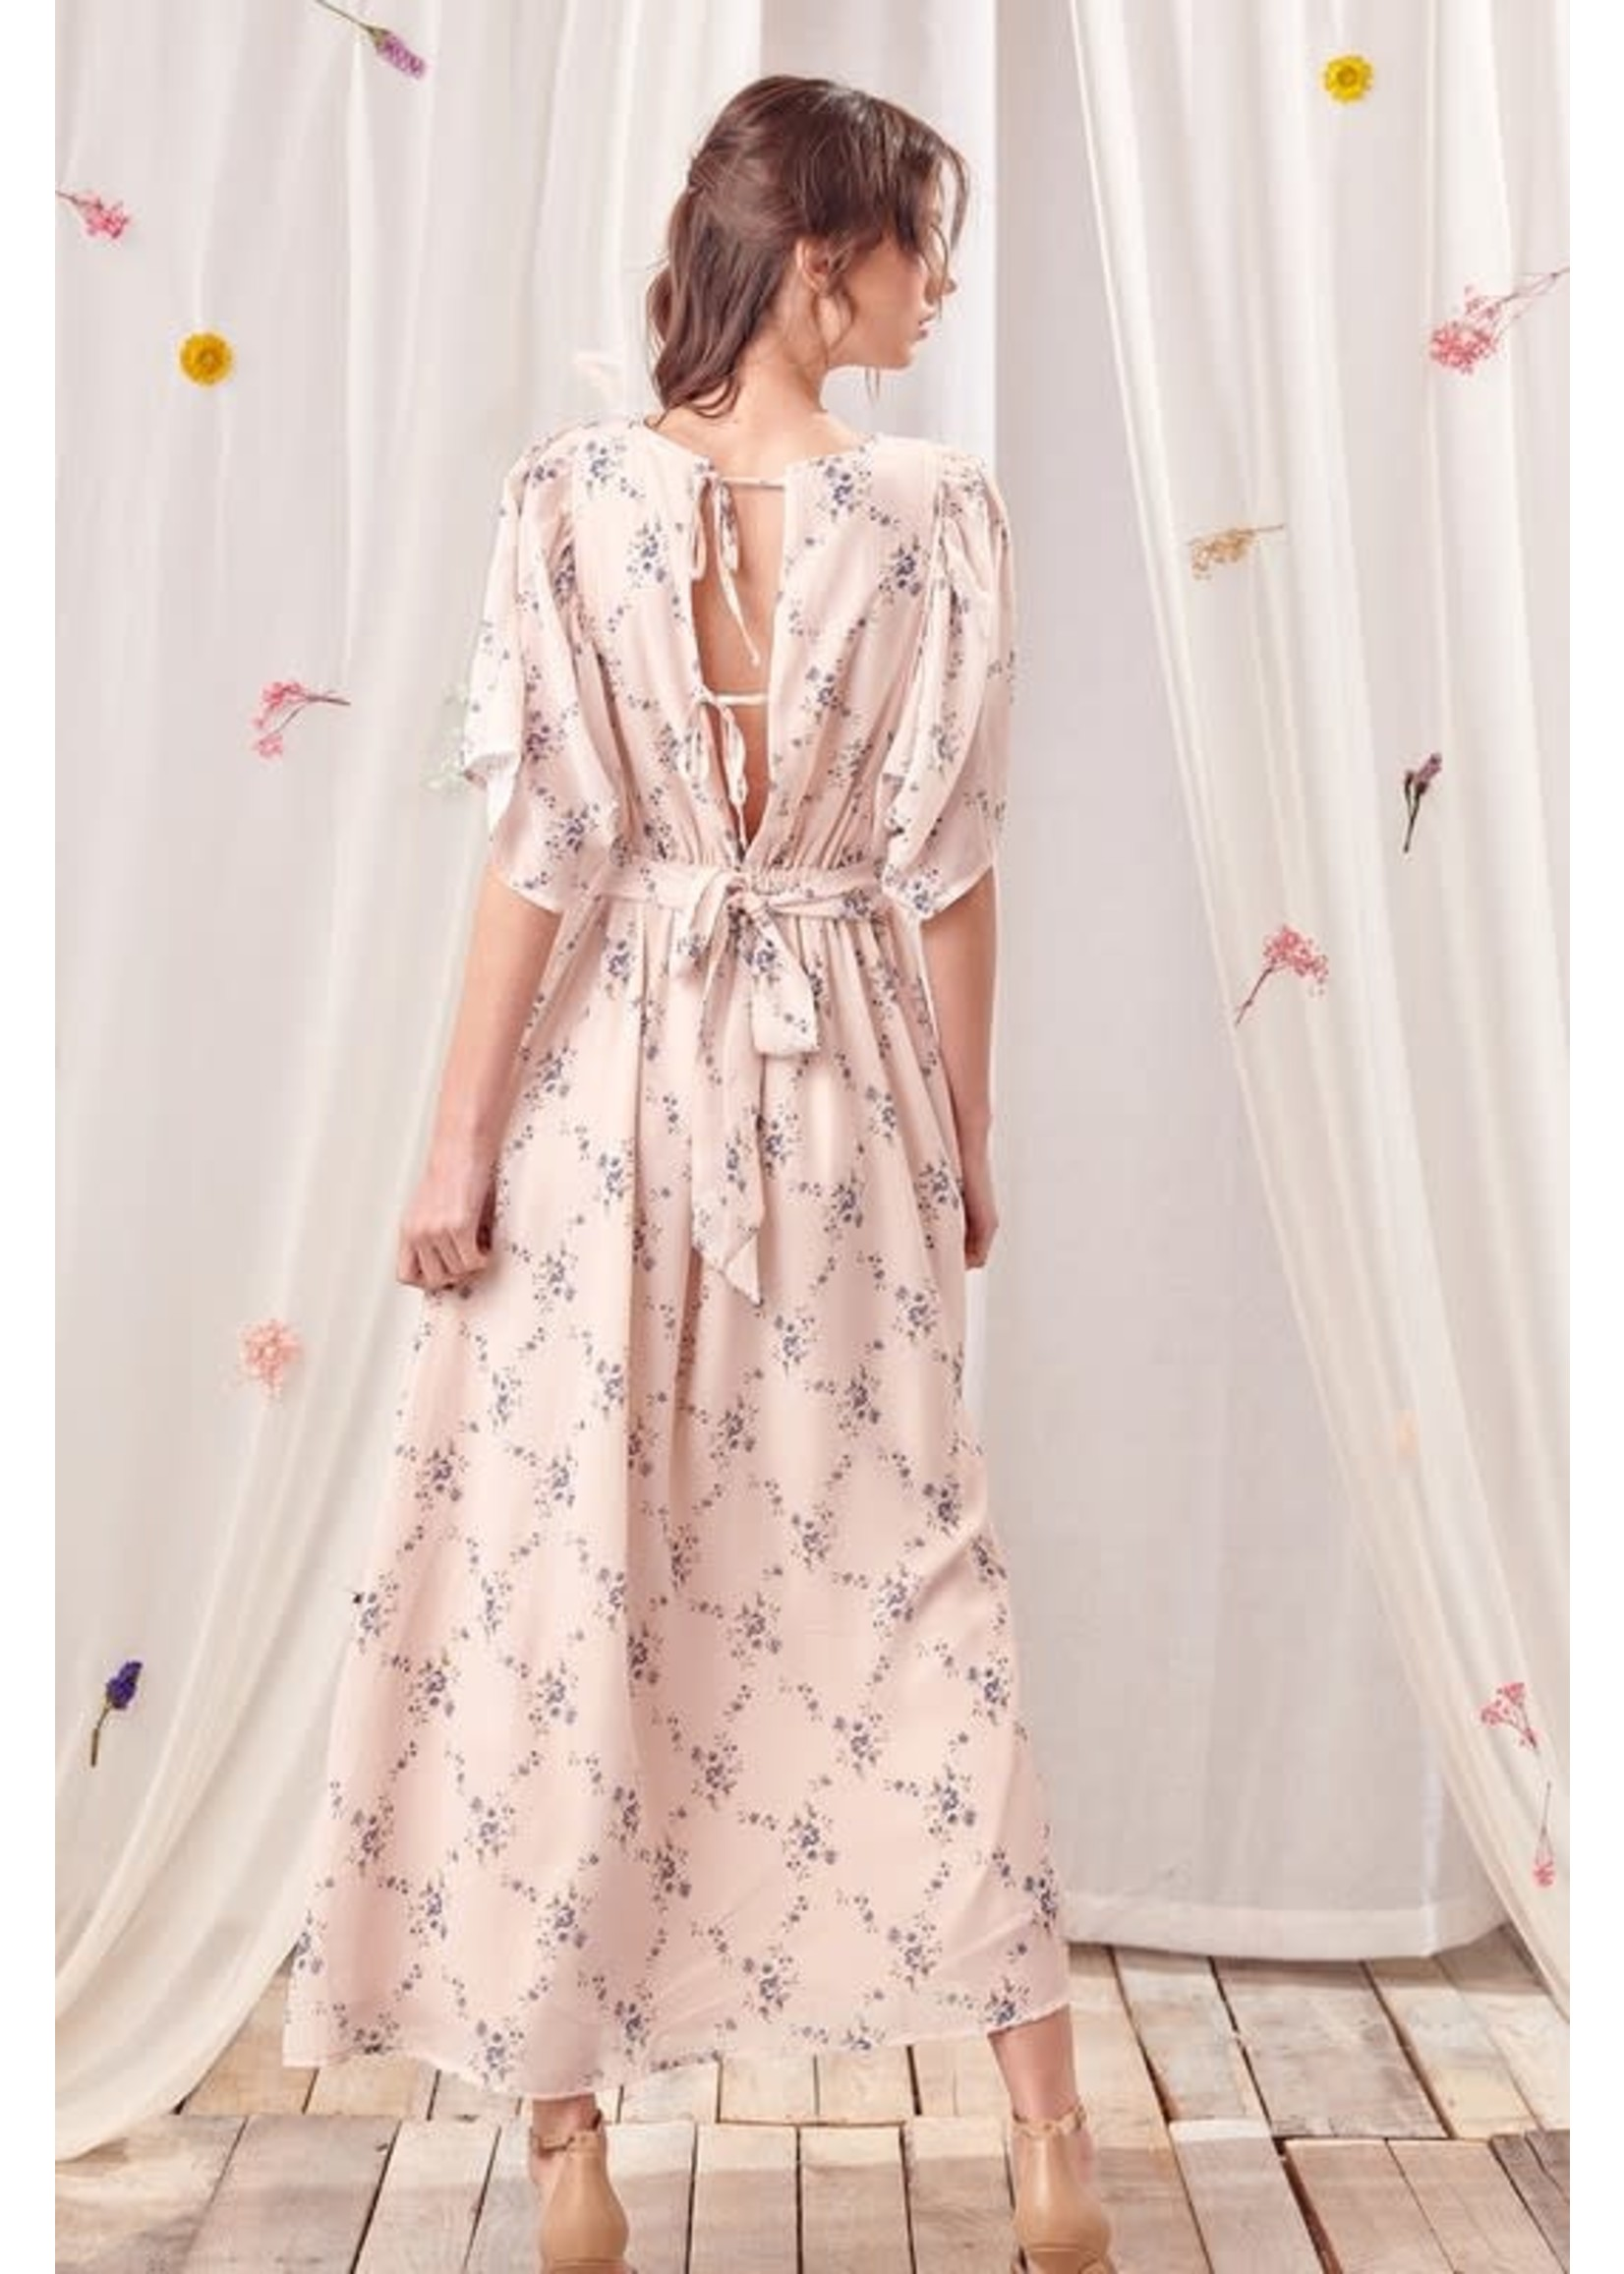 Storia Floral Dolman Sleeved Maxi Dress - SD2904